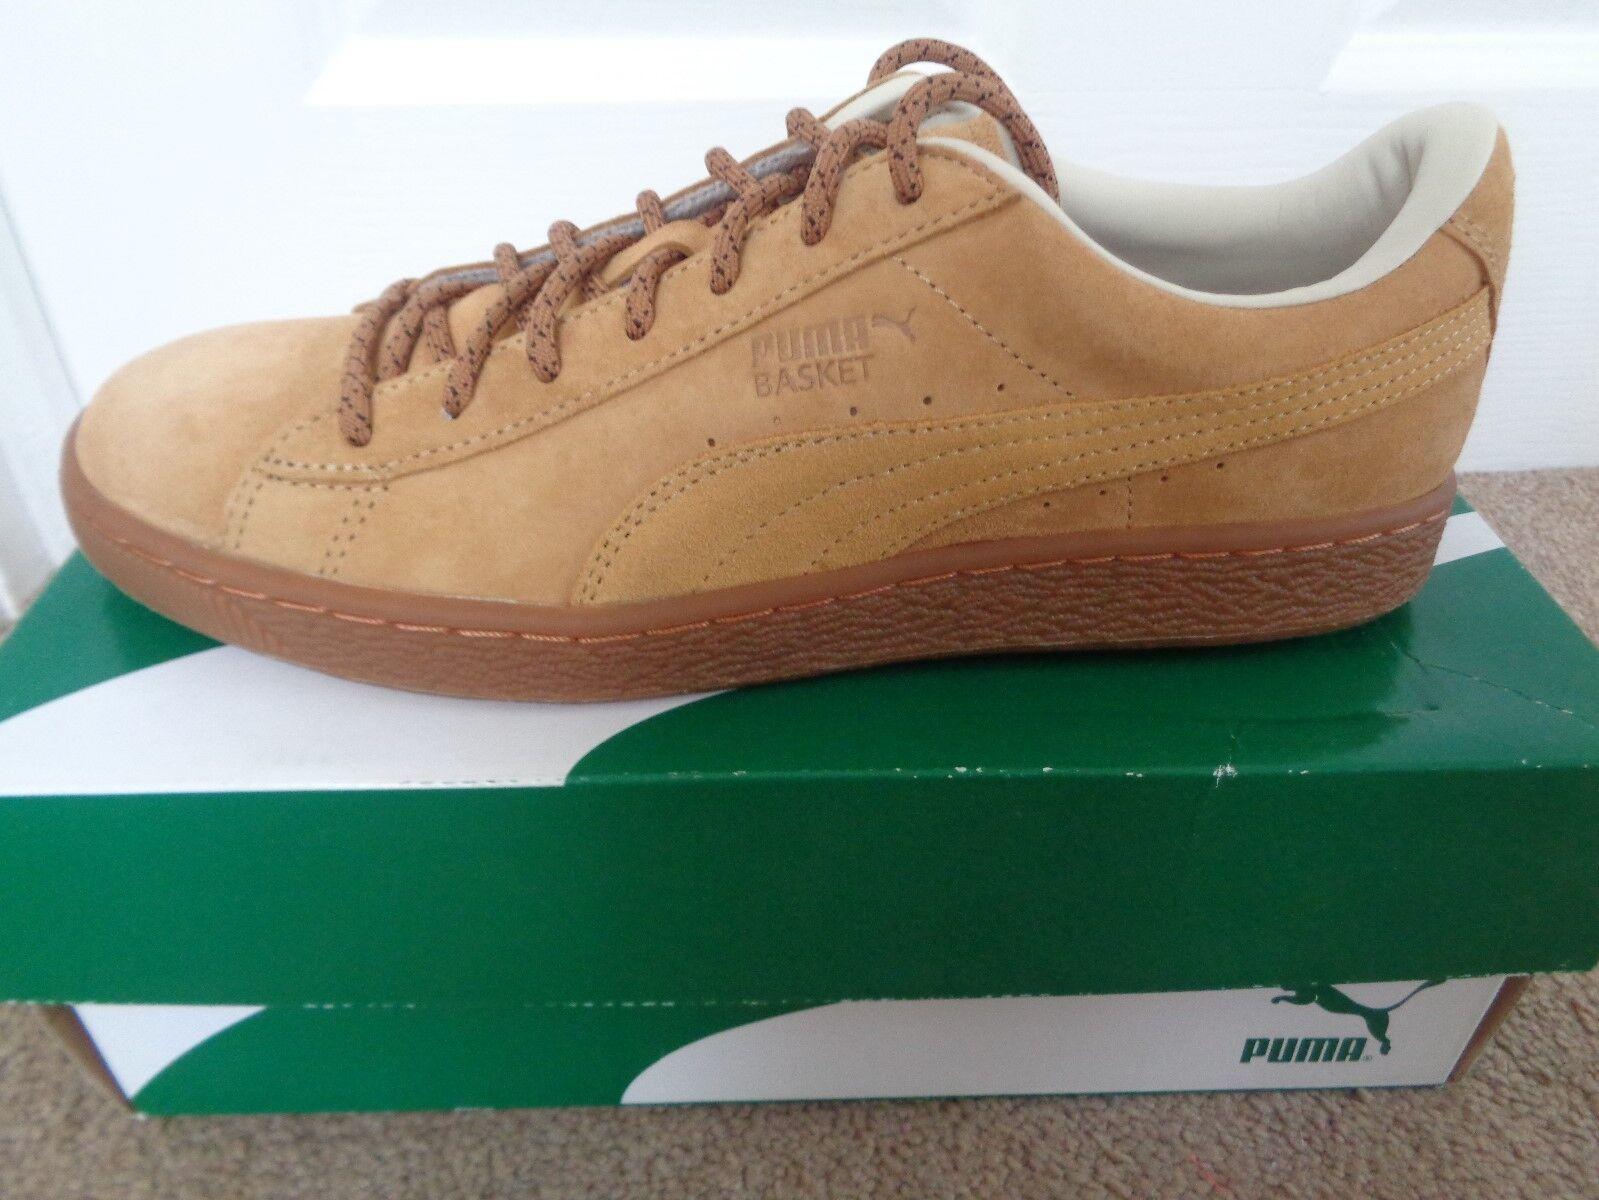 Puma Basket Classic wmns trainers sneakers 361324 01 uk 5.5 eu 38.5 us 6.5 NEW